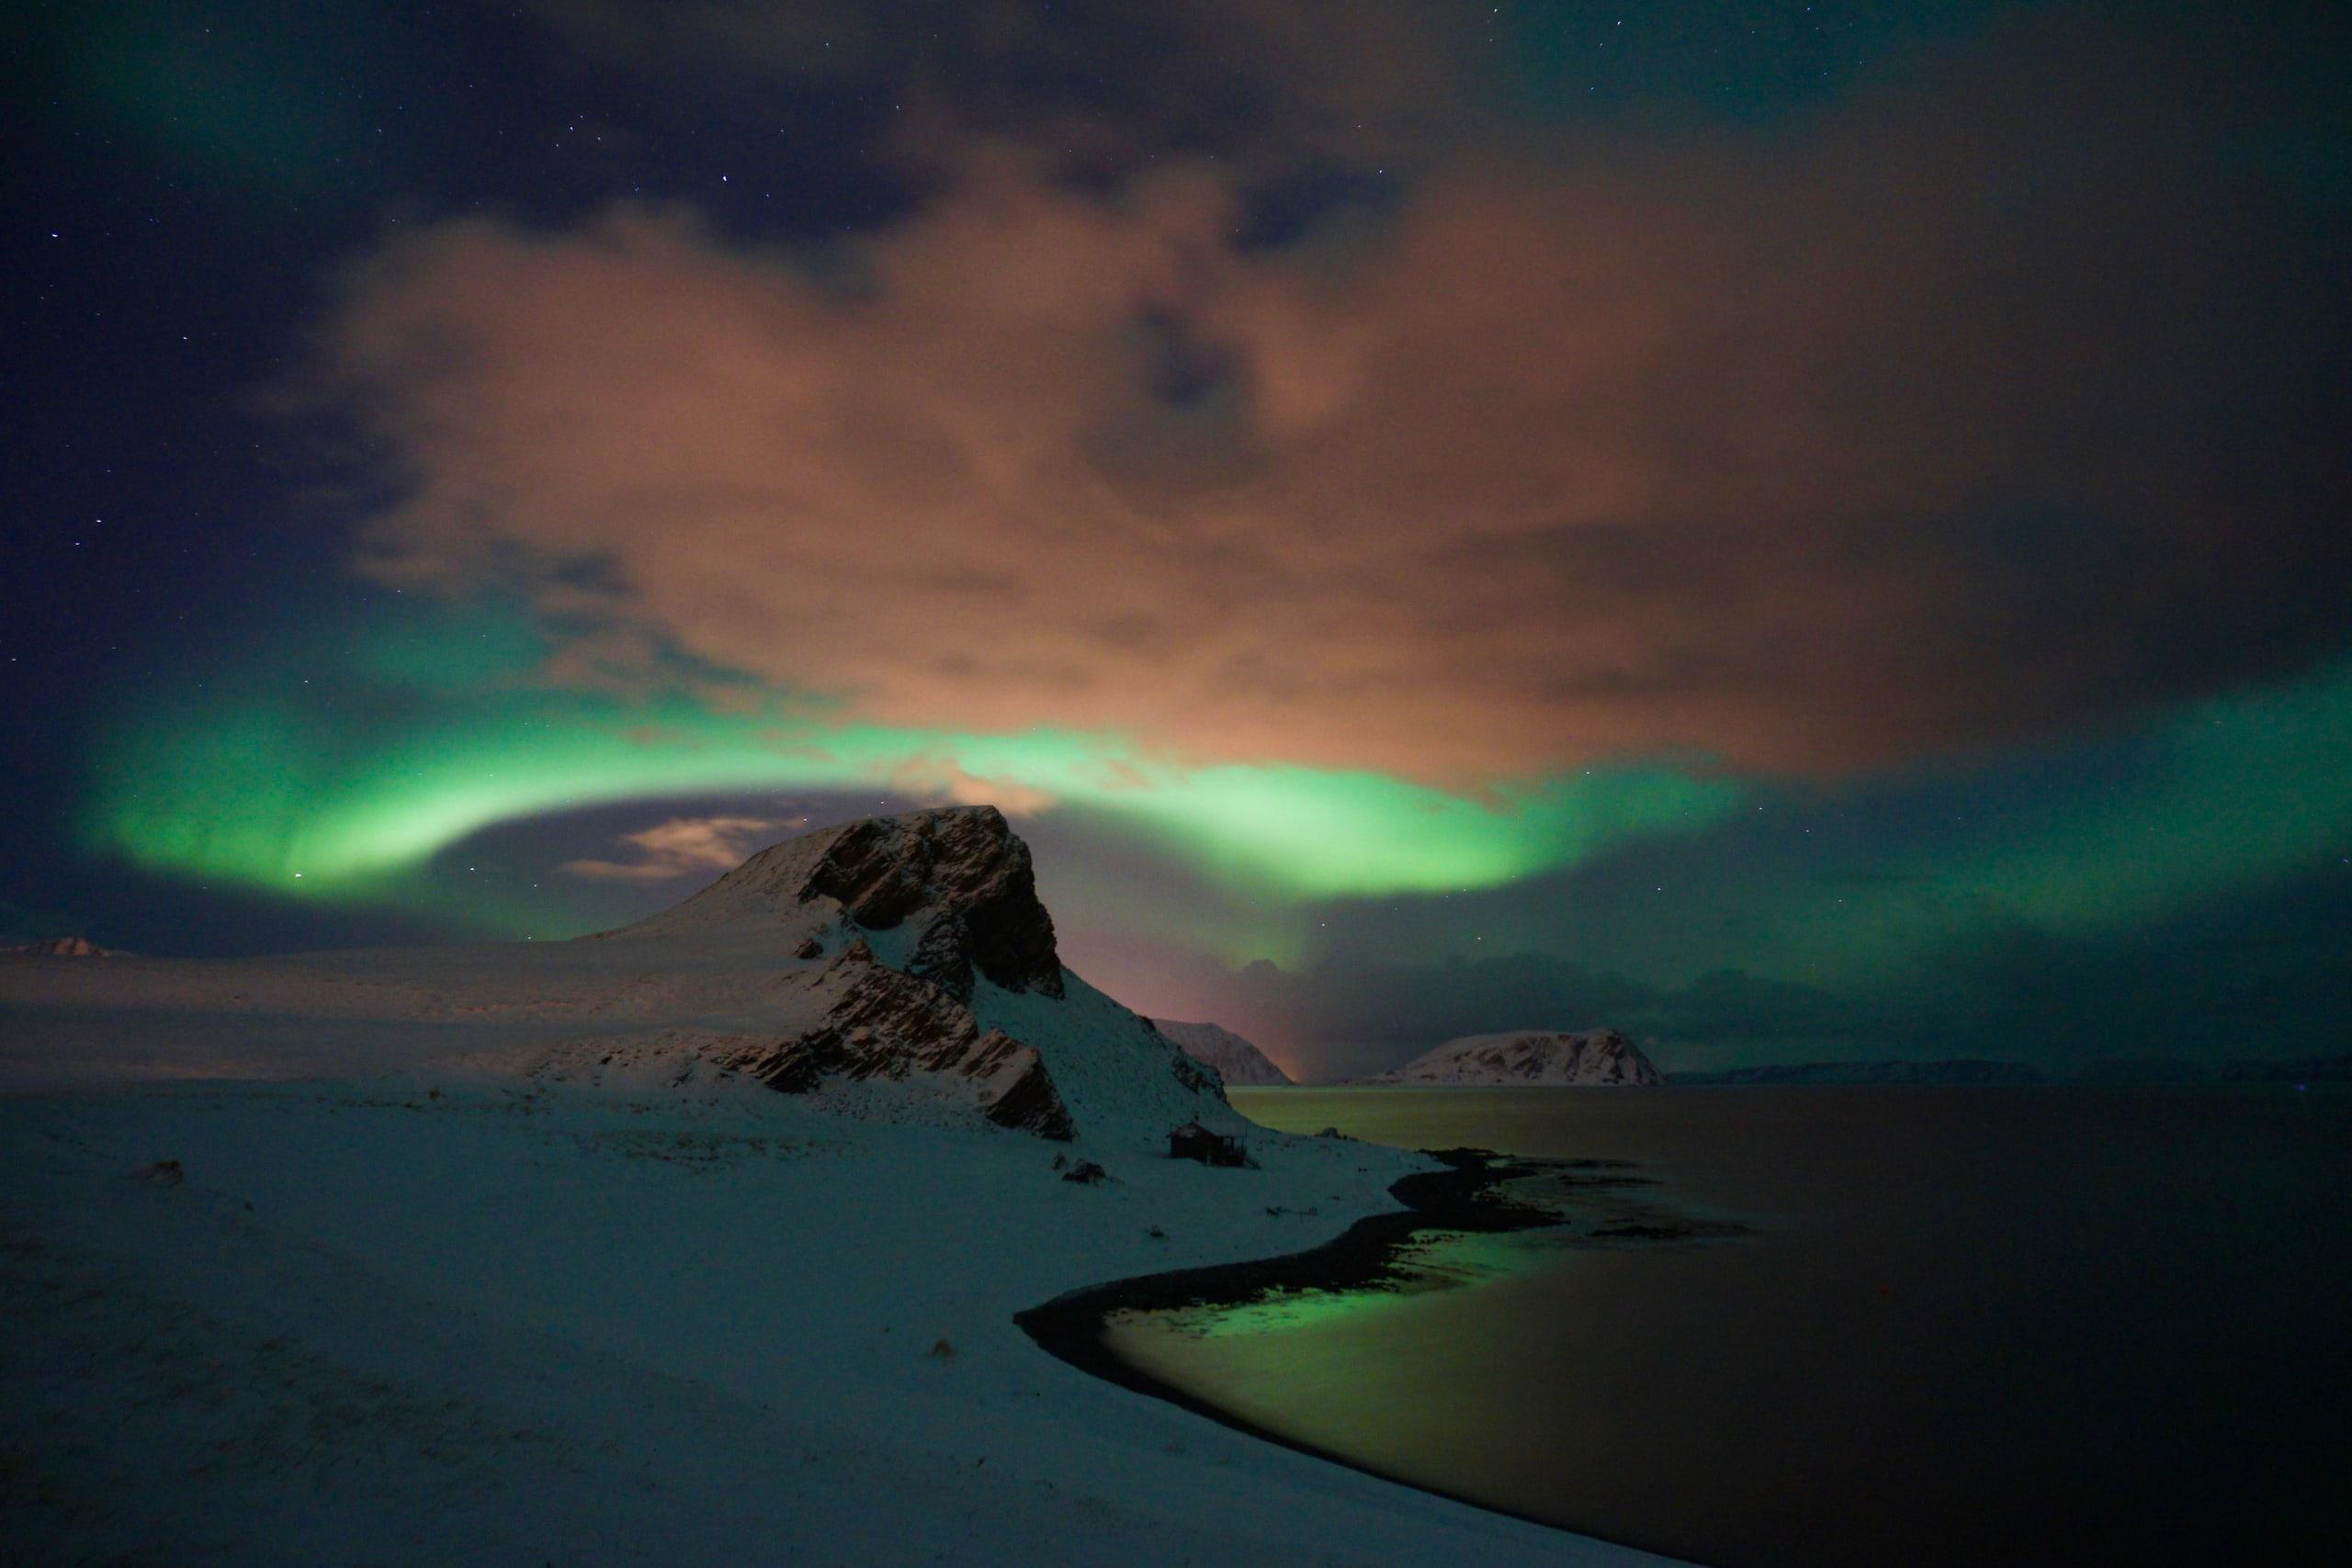 Aurora Borealis at Honningsvåg